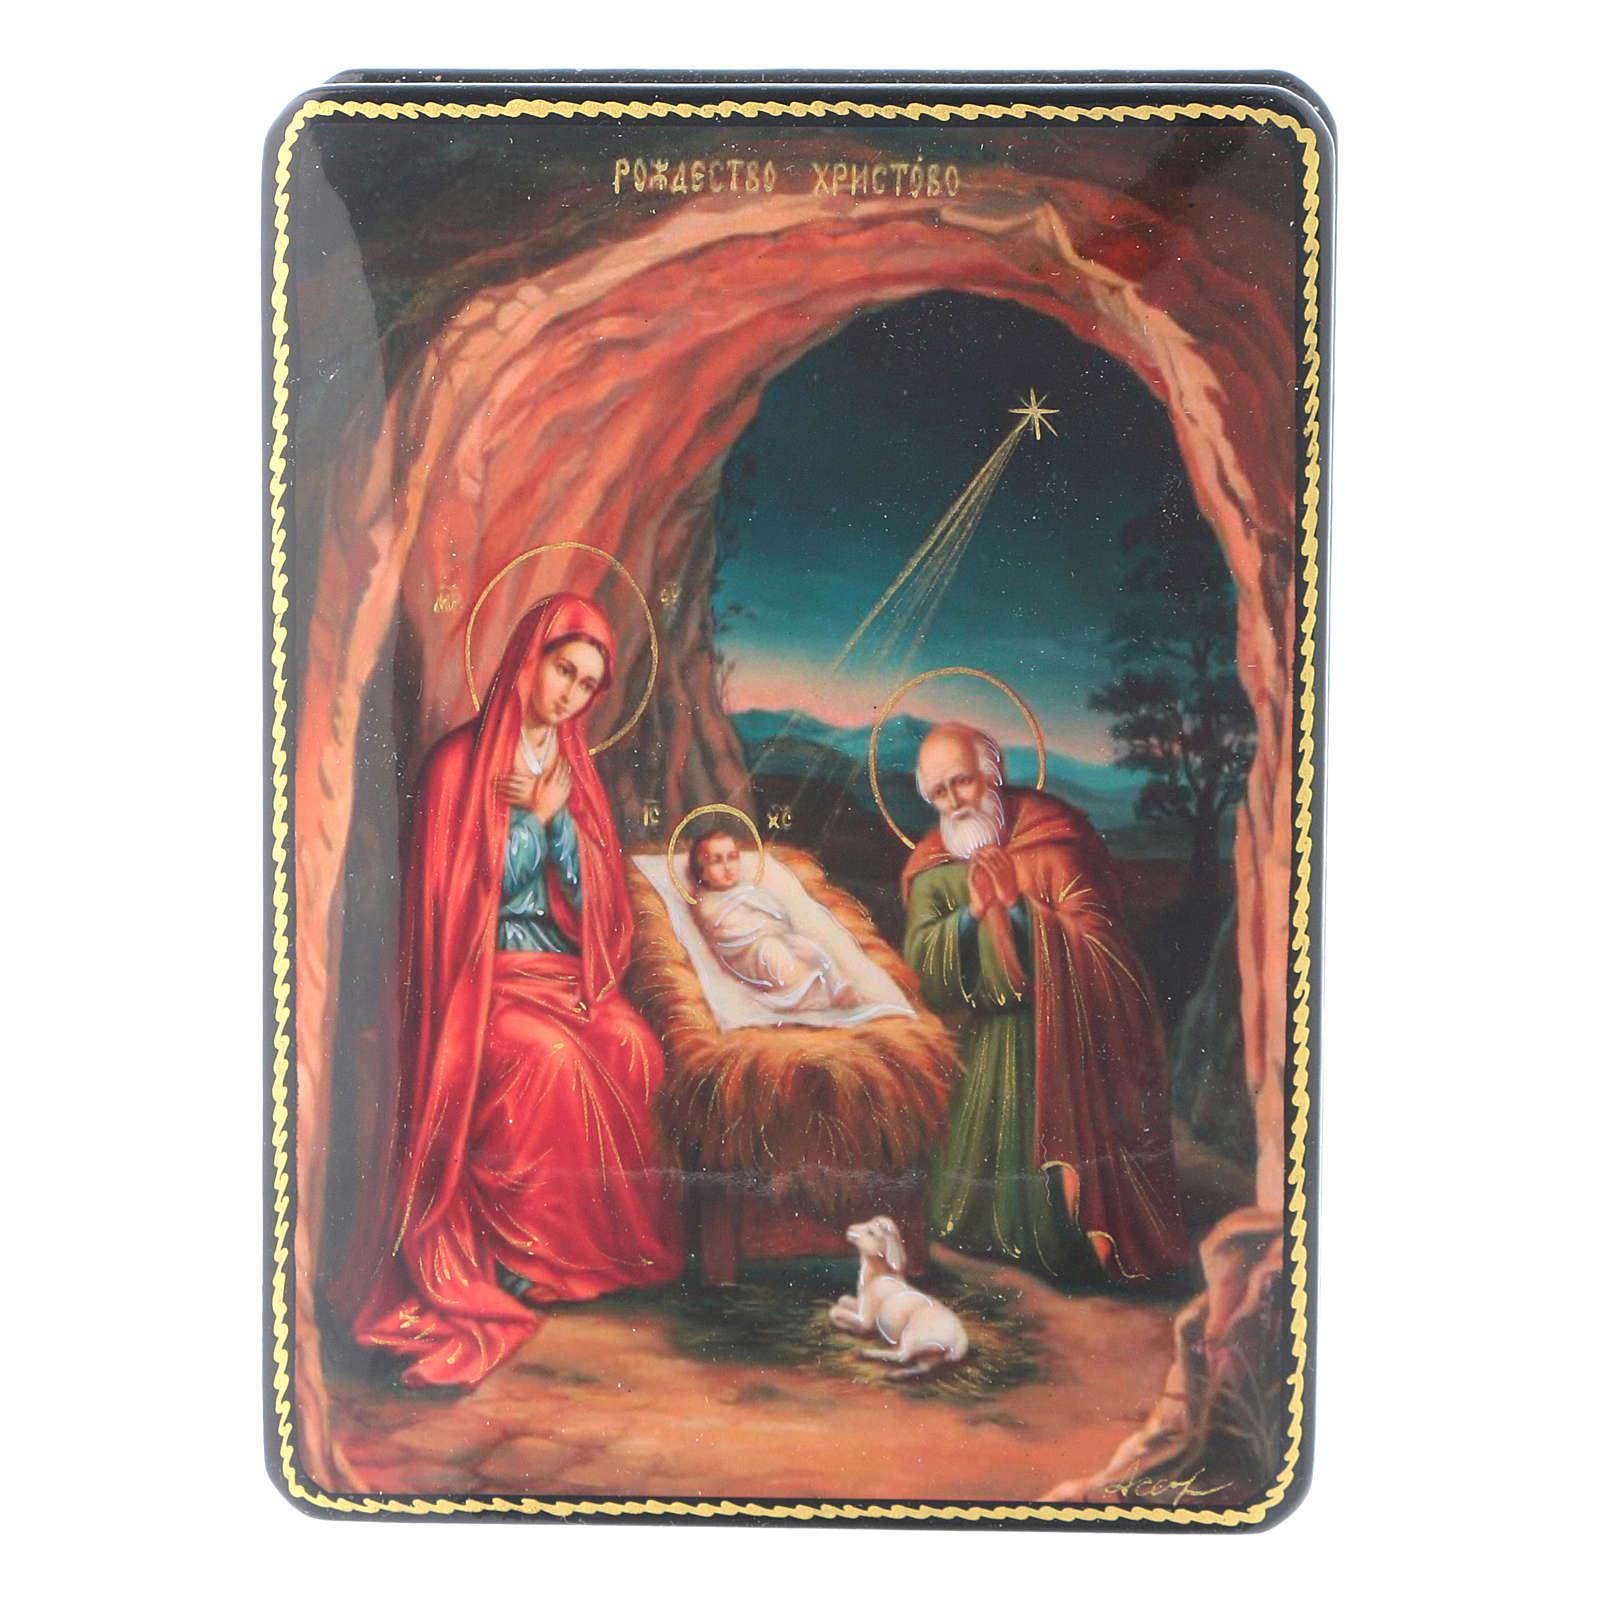 Scatola russa cartapesta Nascita Gesù Cristo Fedoskino style 15x11 4